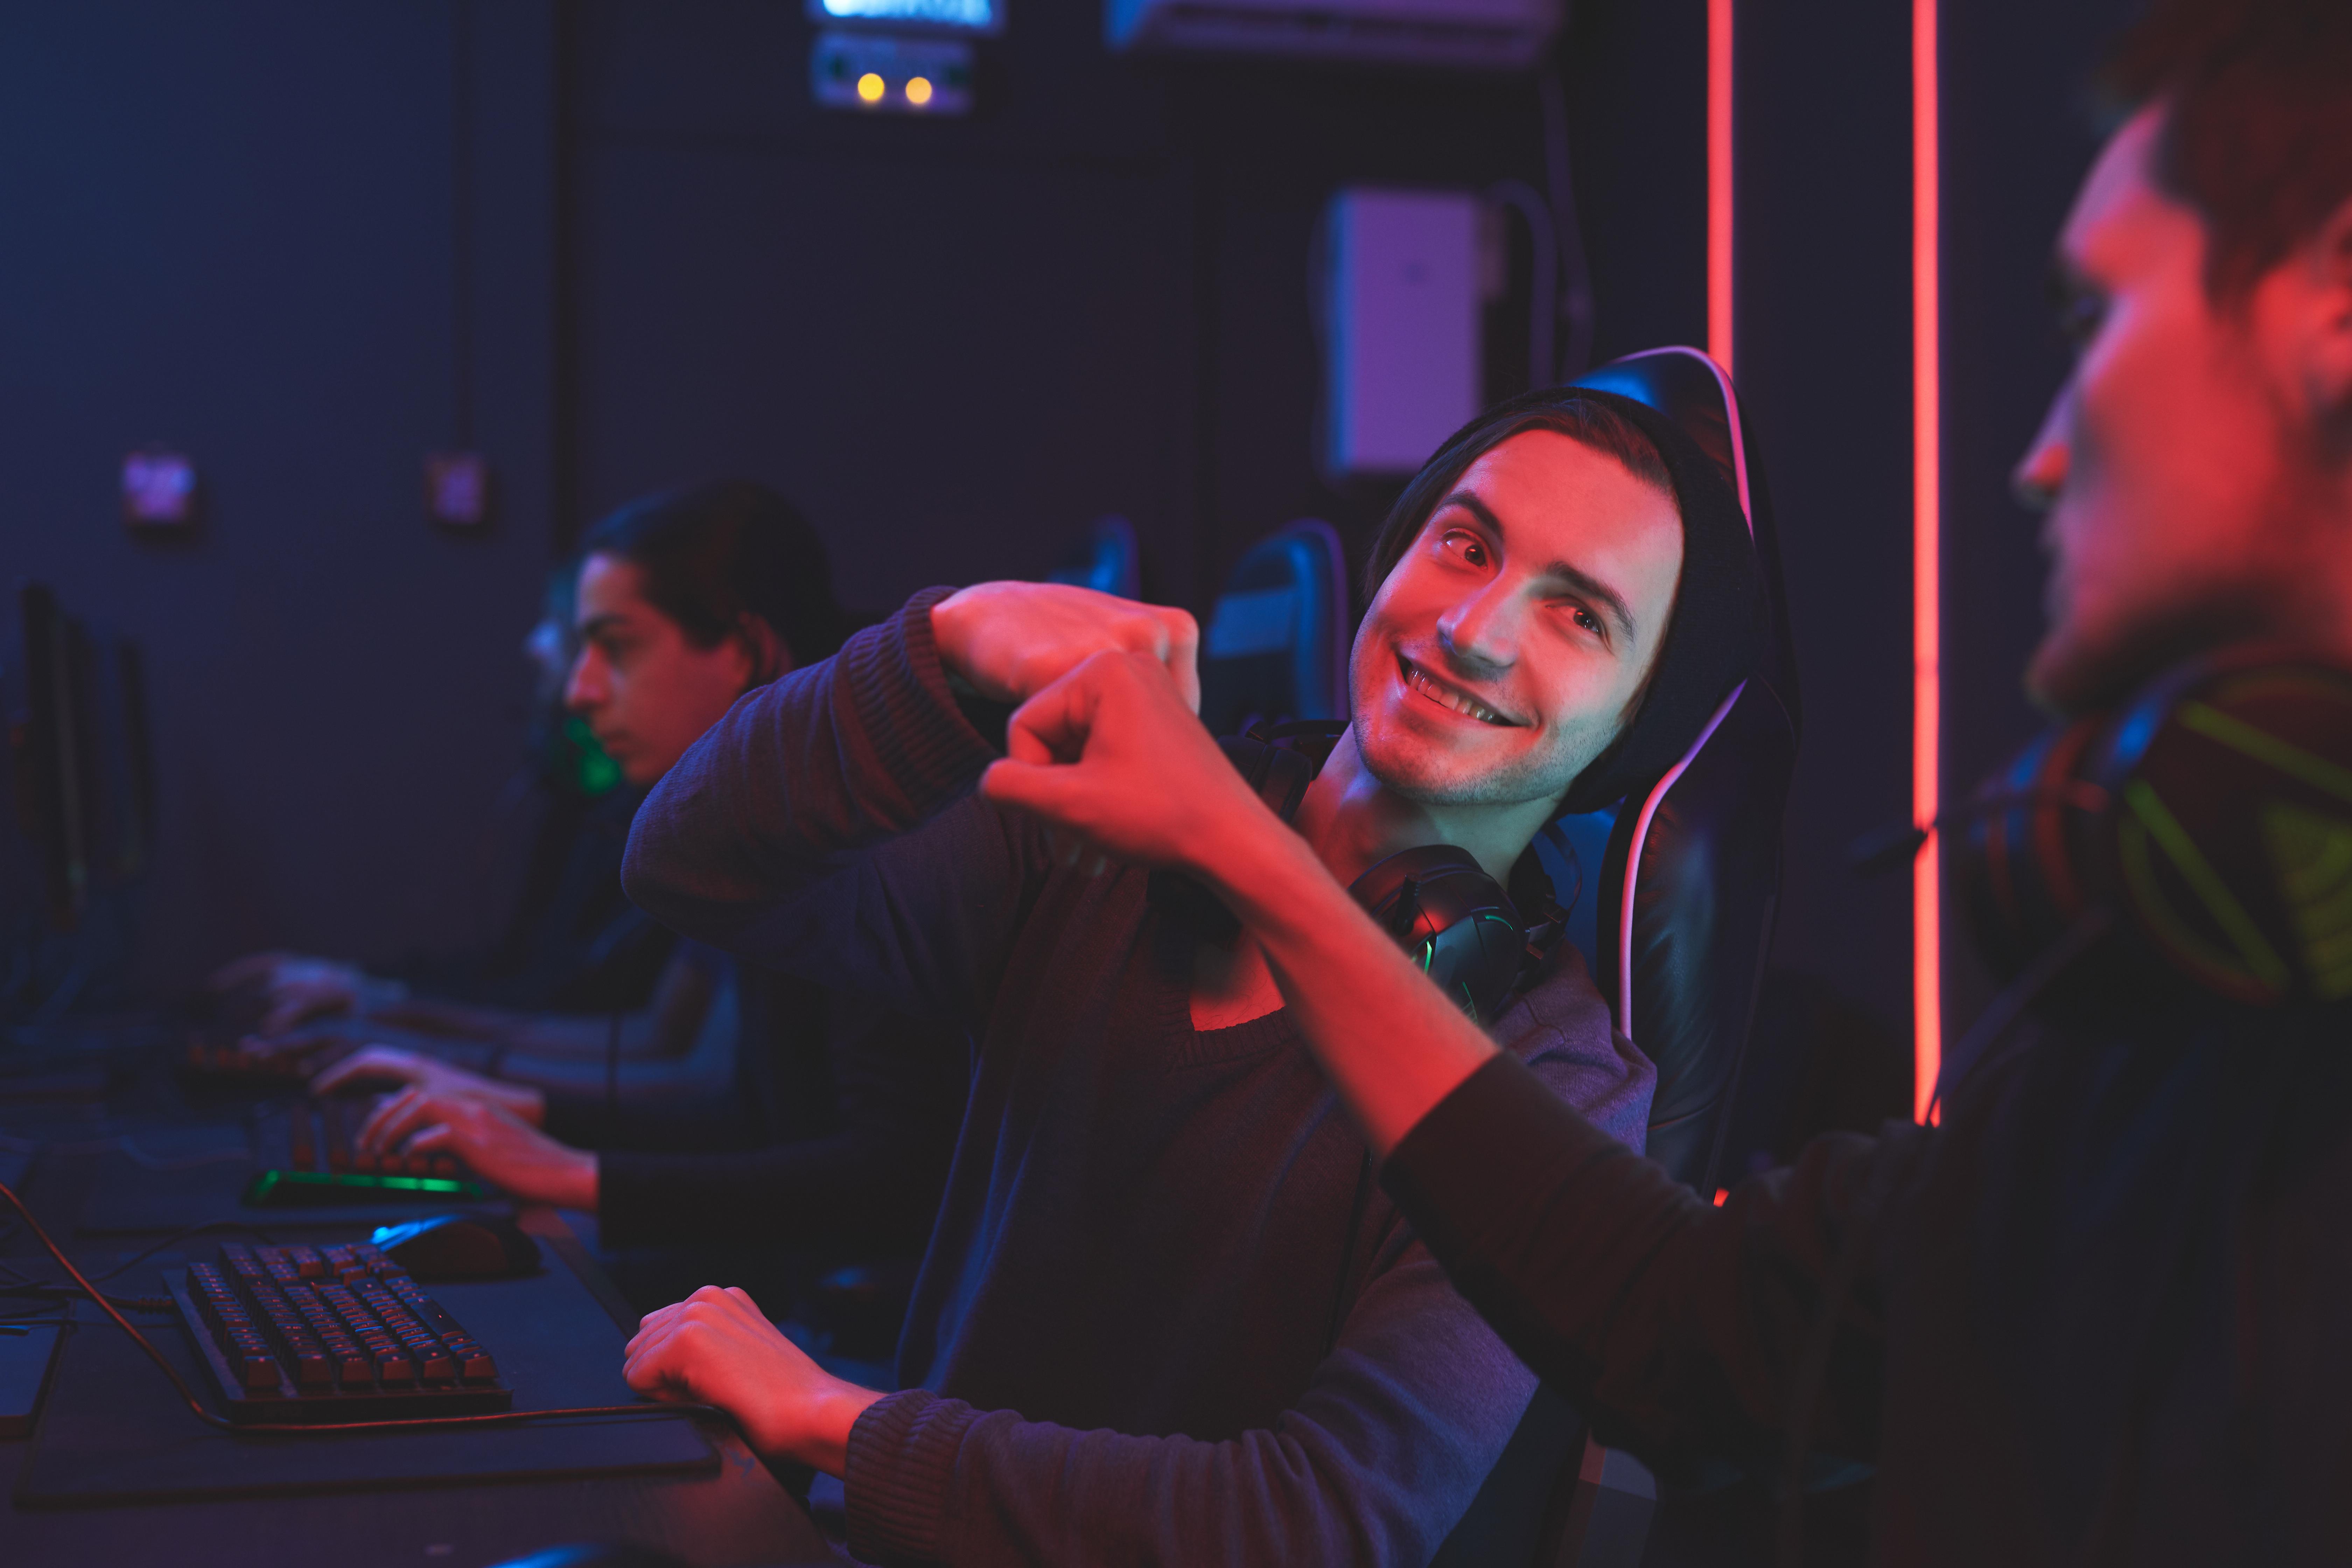 team-of-computer-gamers-celebrating-win-S2THKFL.jpg